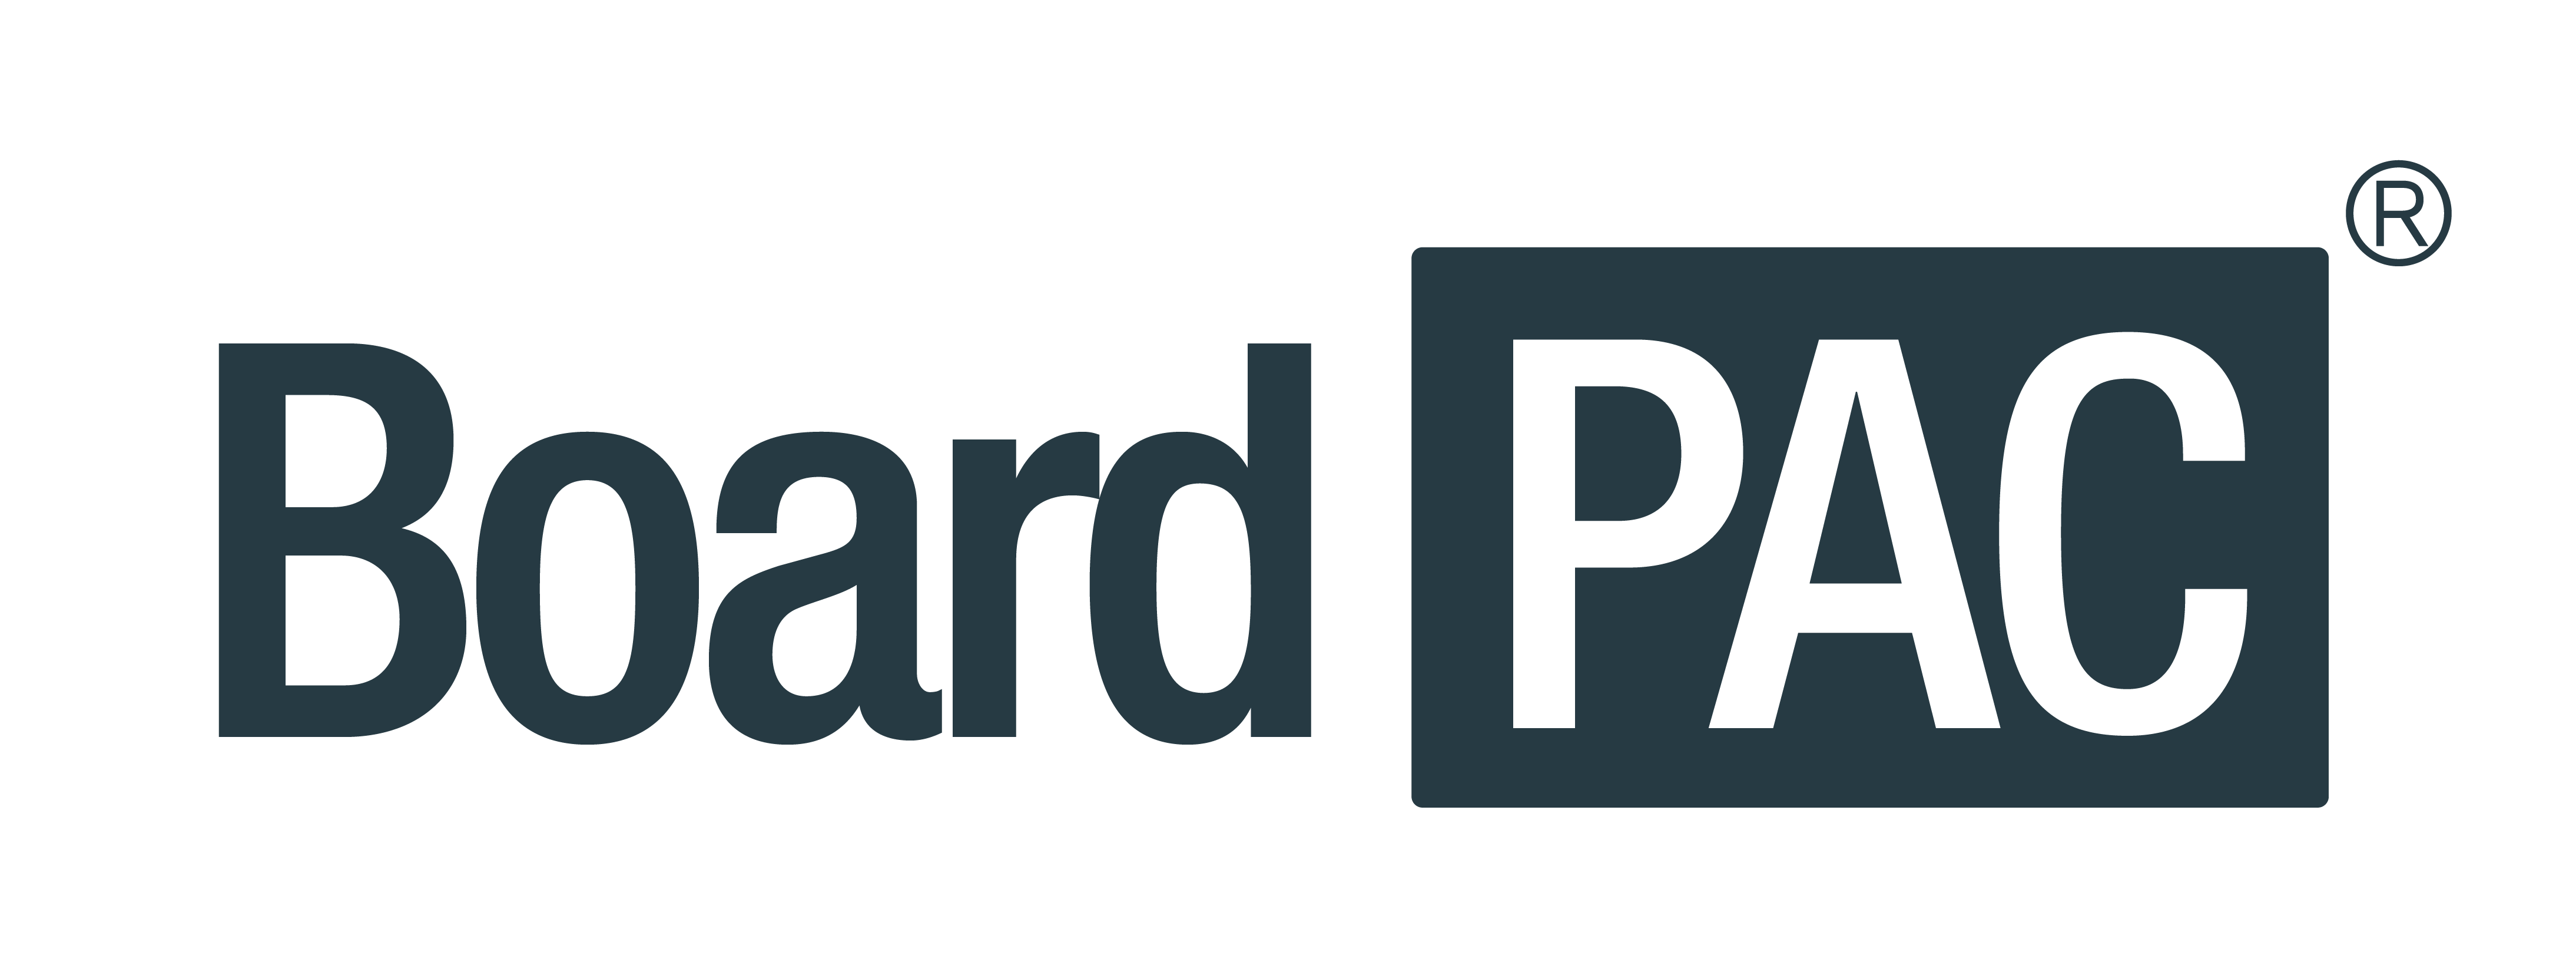 BoardPAC logo